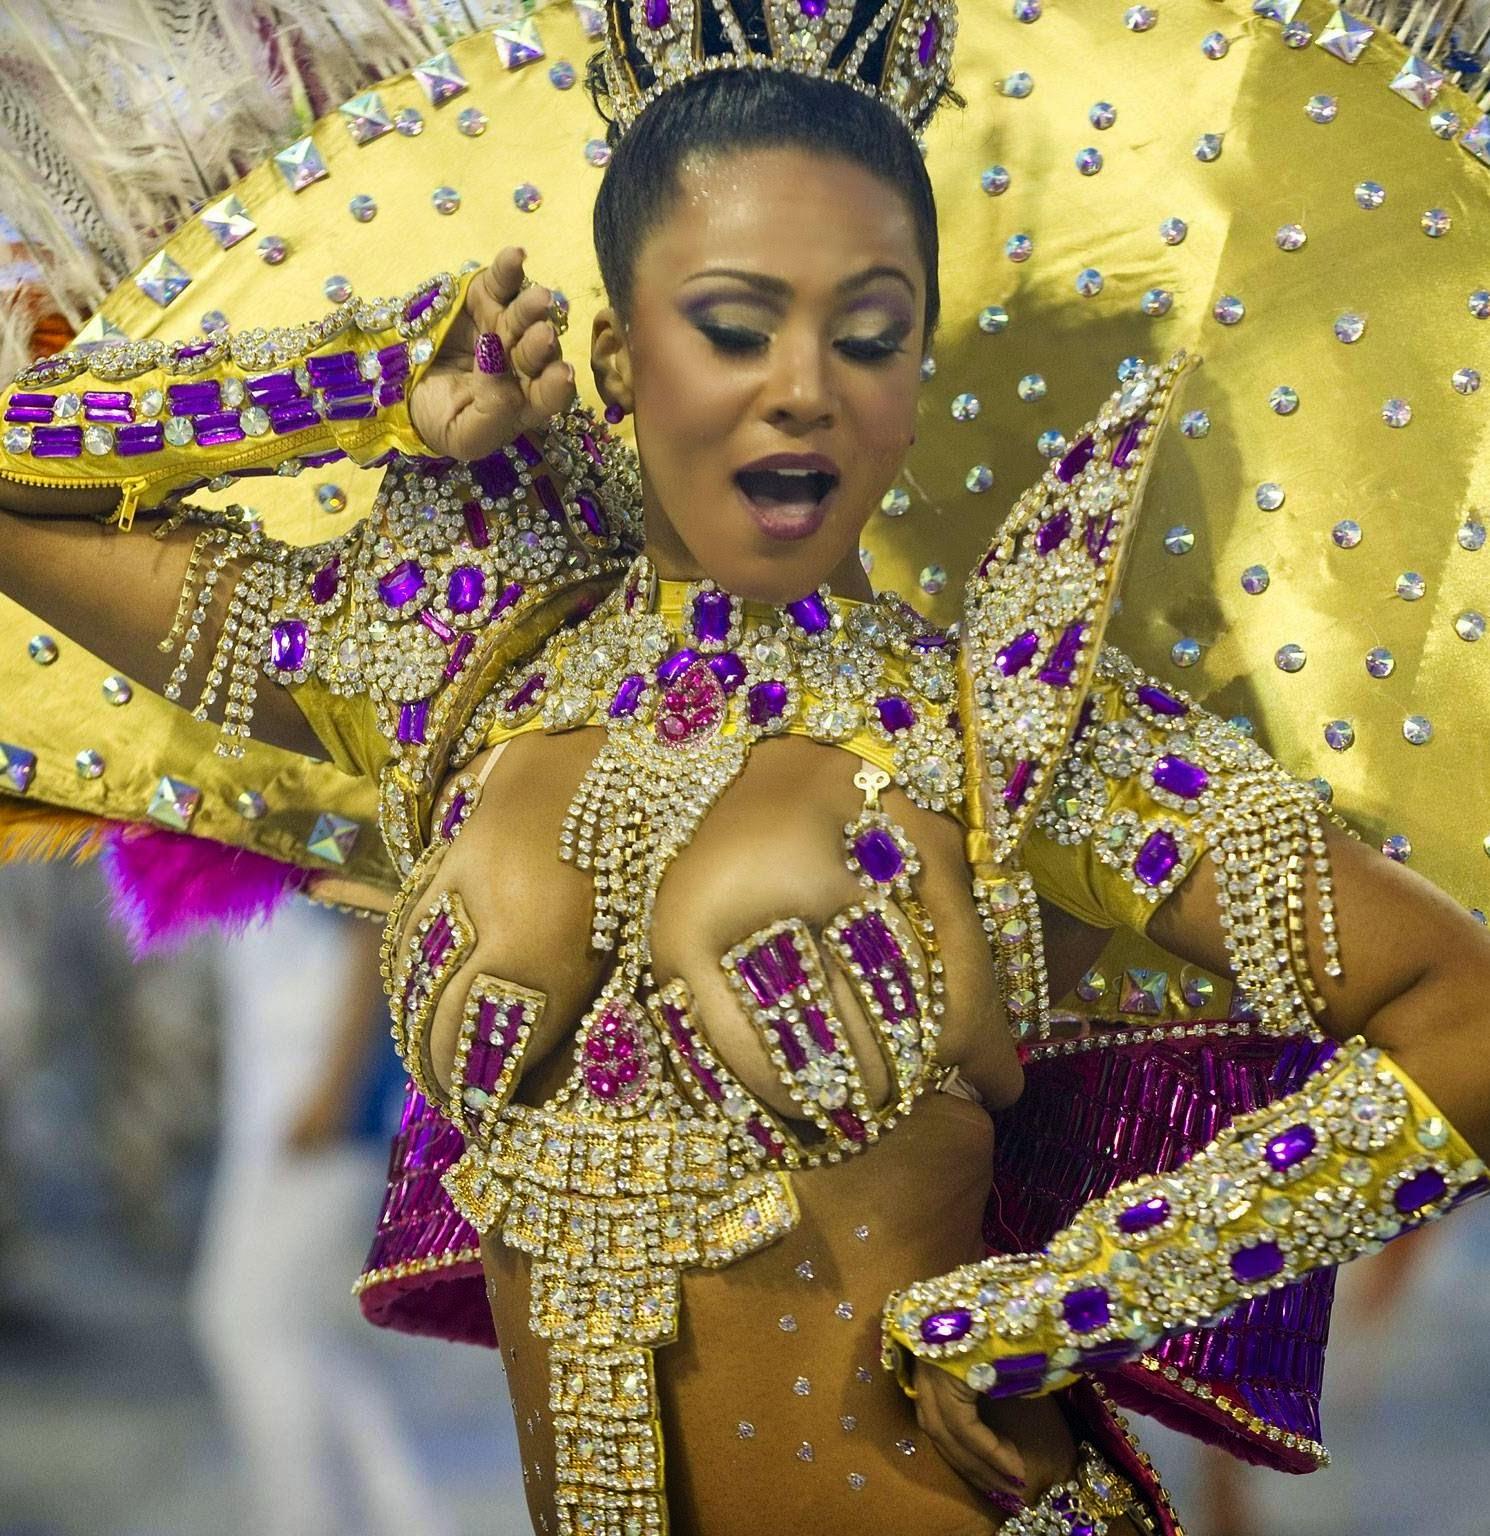 Model Bahian Woman In Traditional Dress At The Pelourinho District Salvador